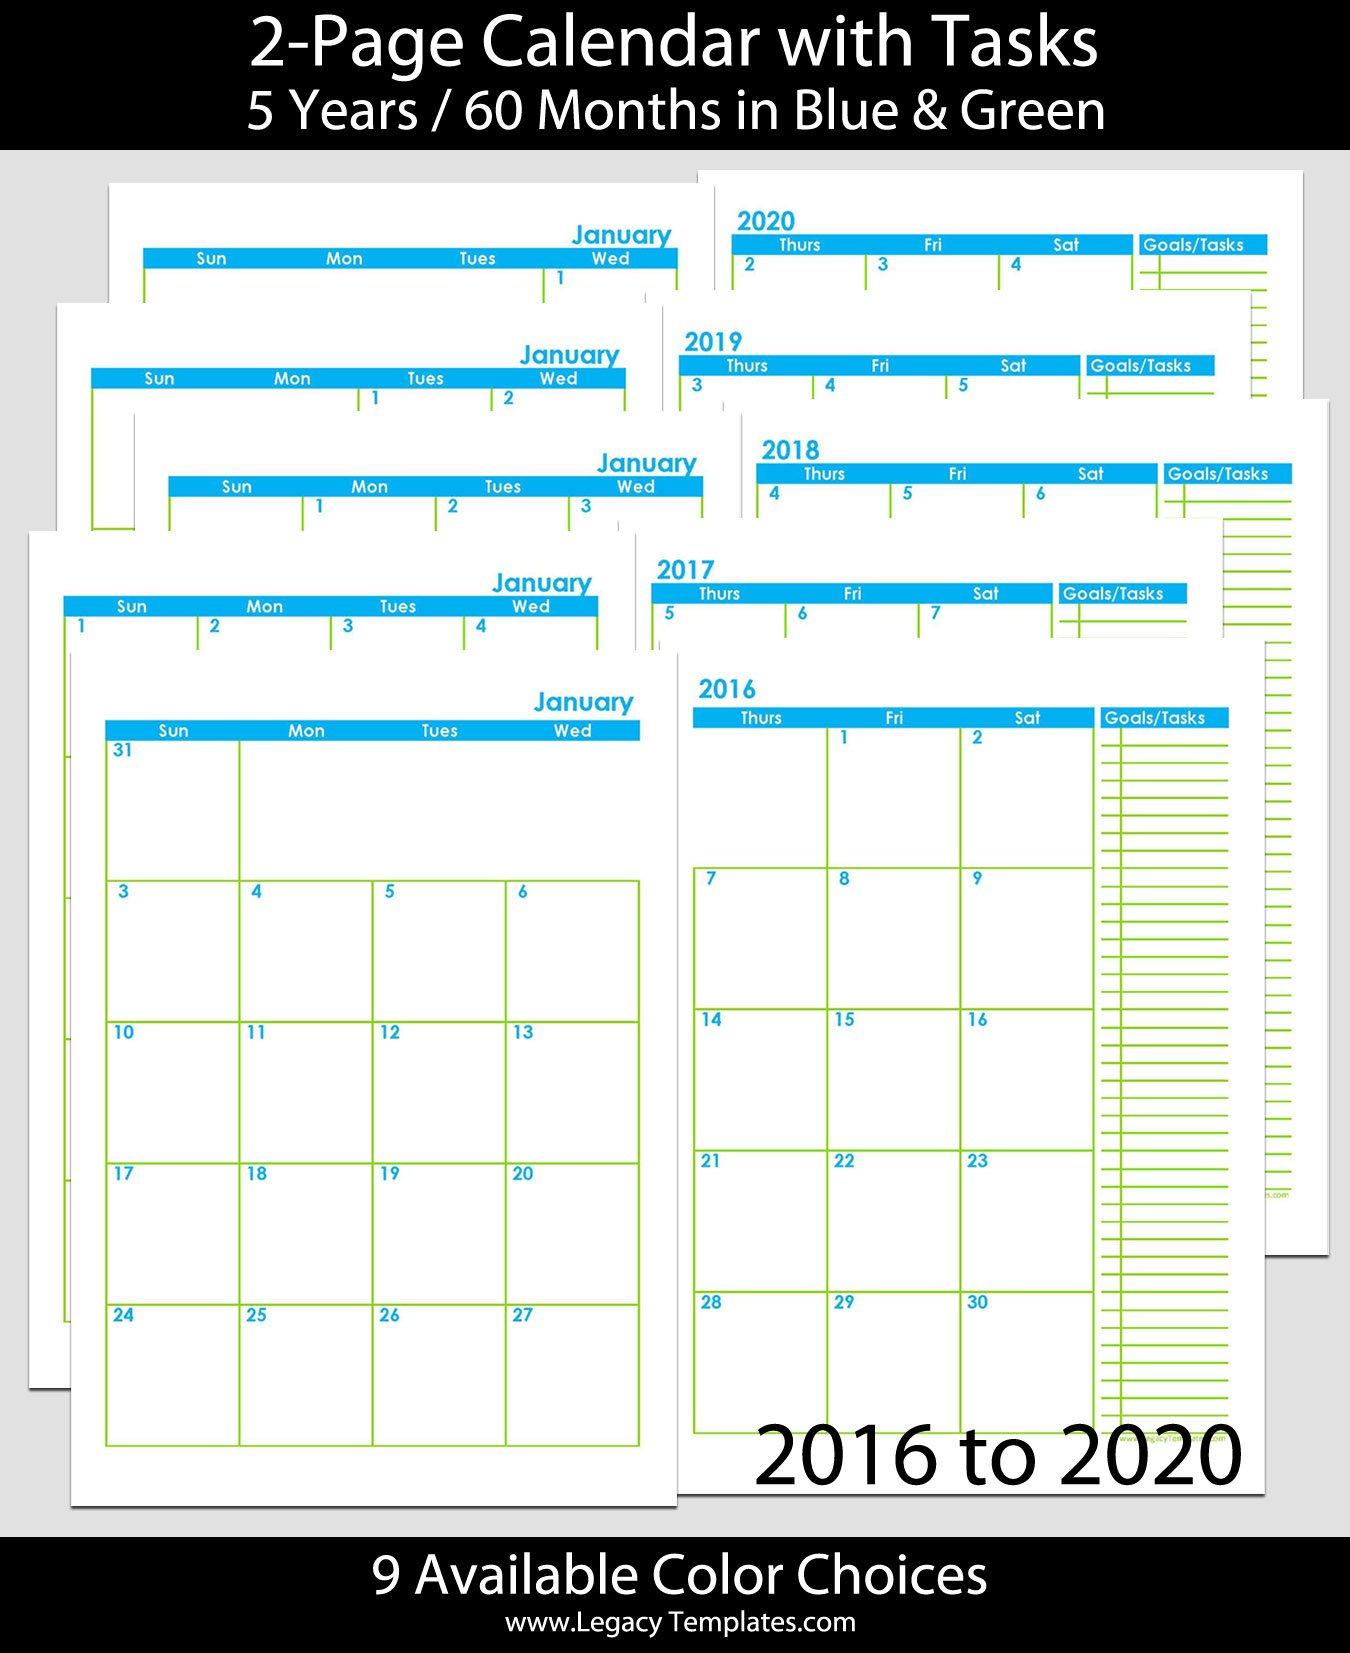 2016 Thru 2020 60-Months 2-Page Calendar - A5 | Legacy How To Print A Calendar Full Page 8 X 11